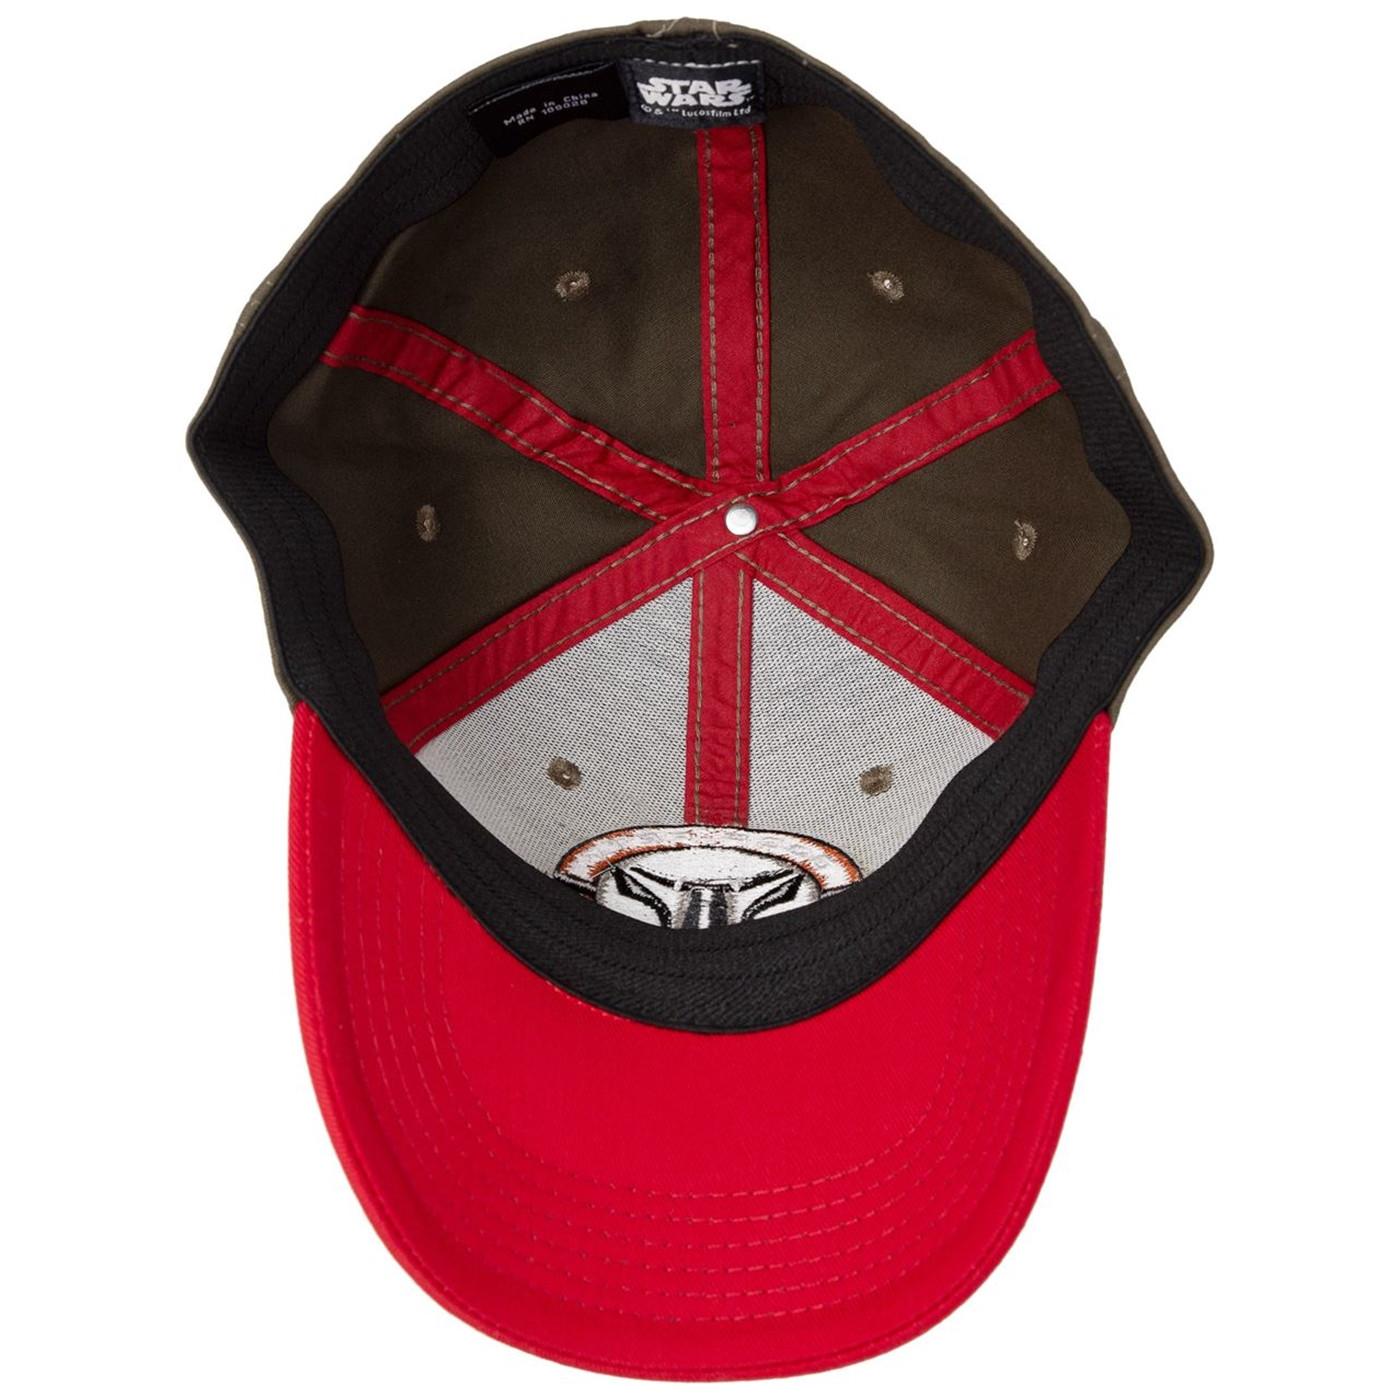 Star Wars Boba Fett Stretch Fit Hat